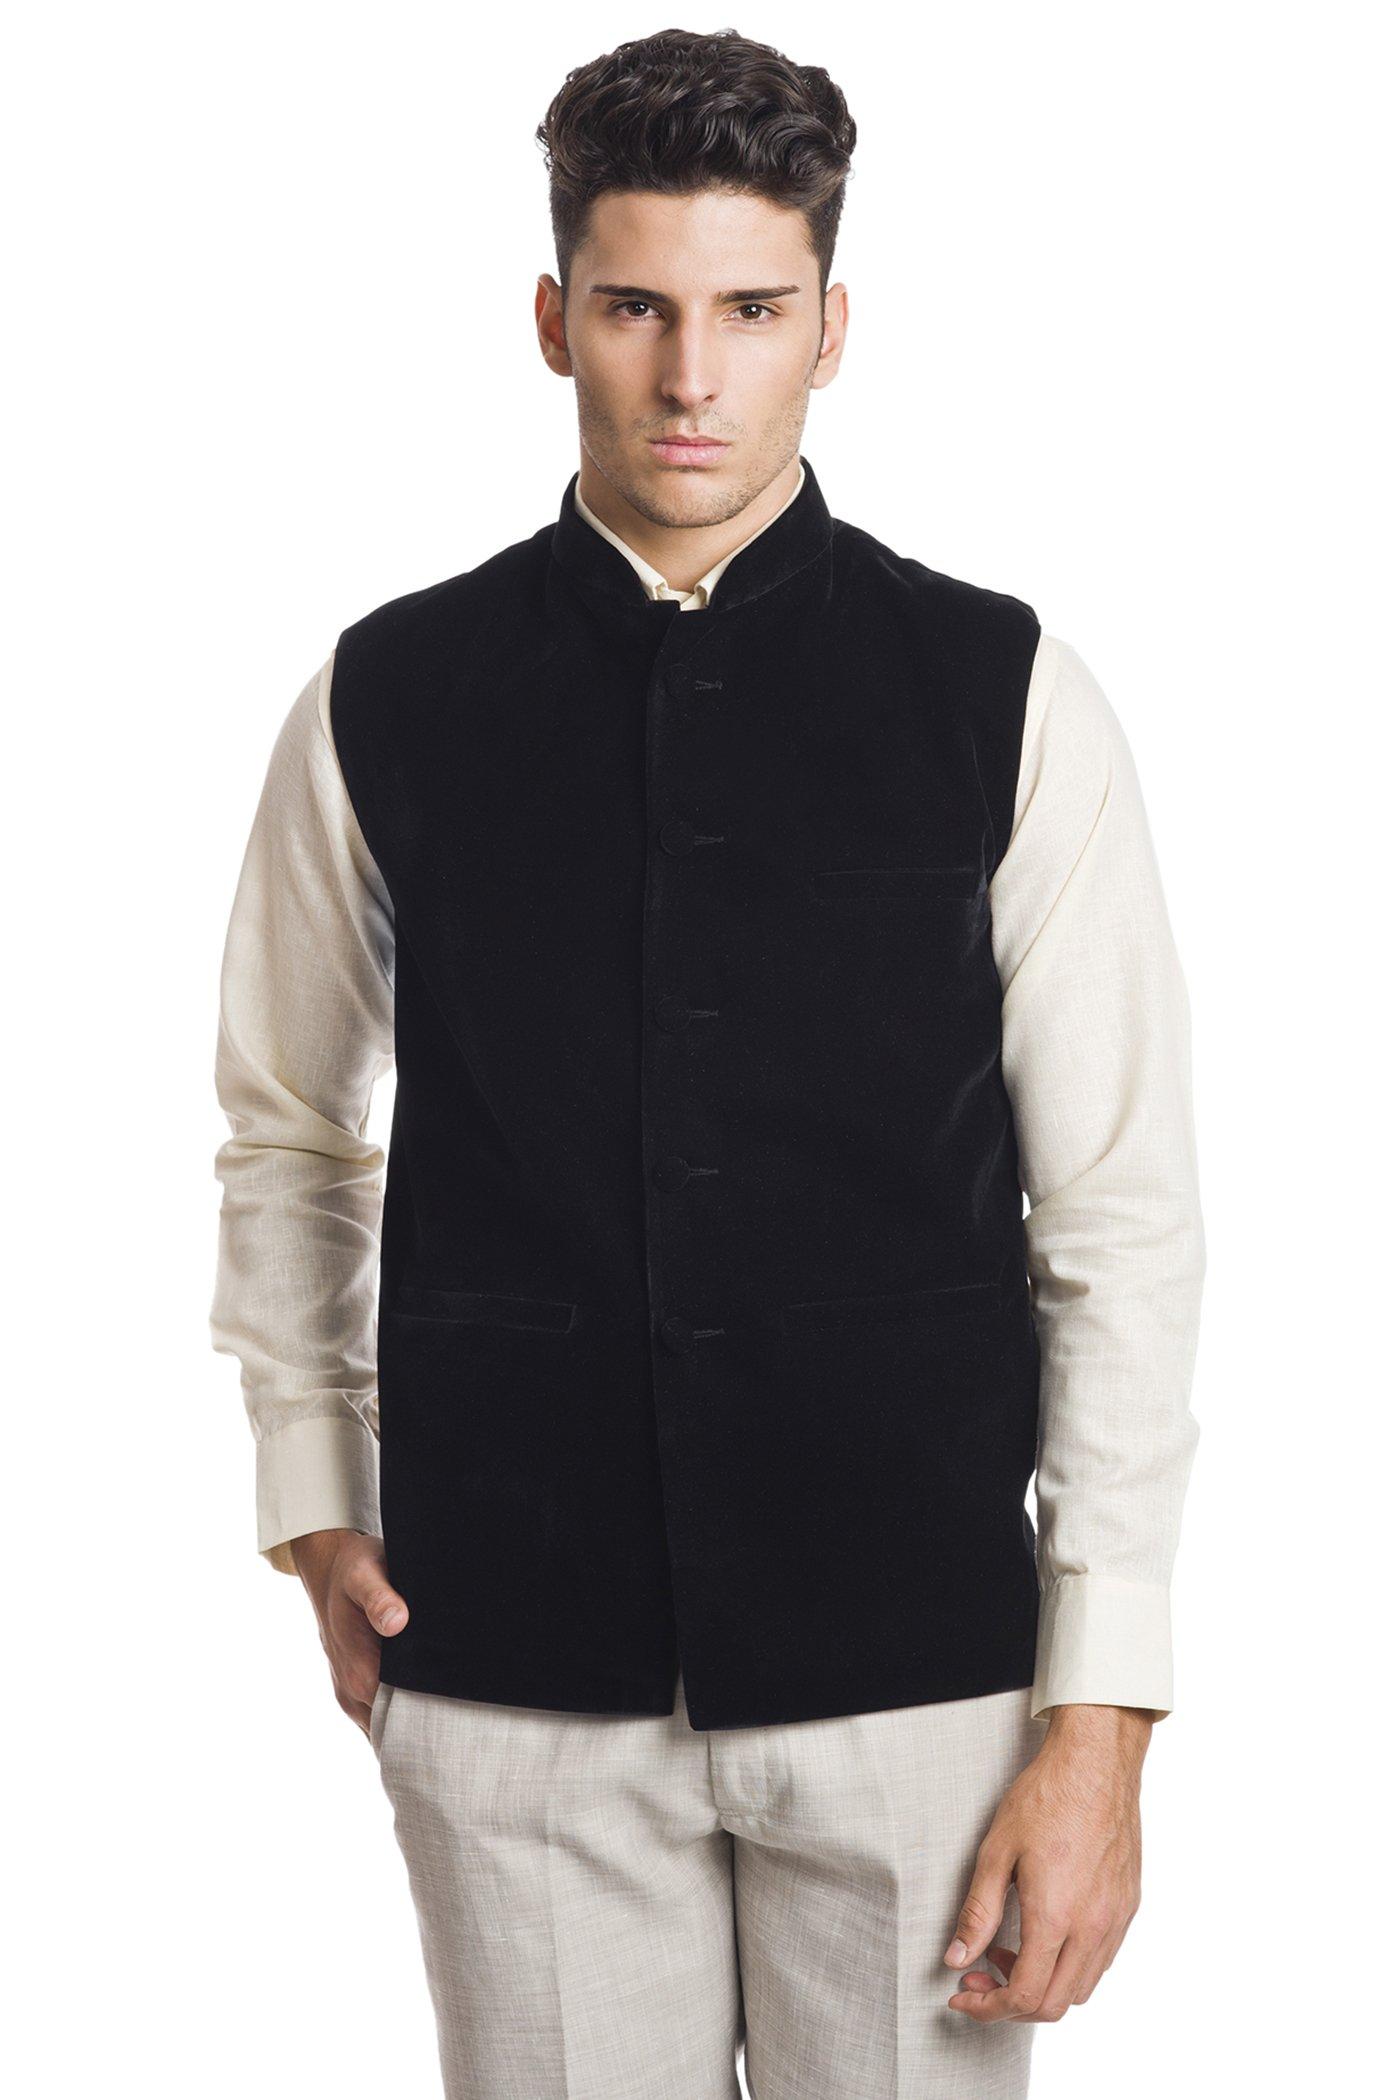 Black Vest with Sleeves